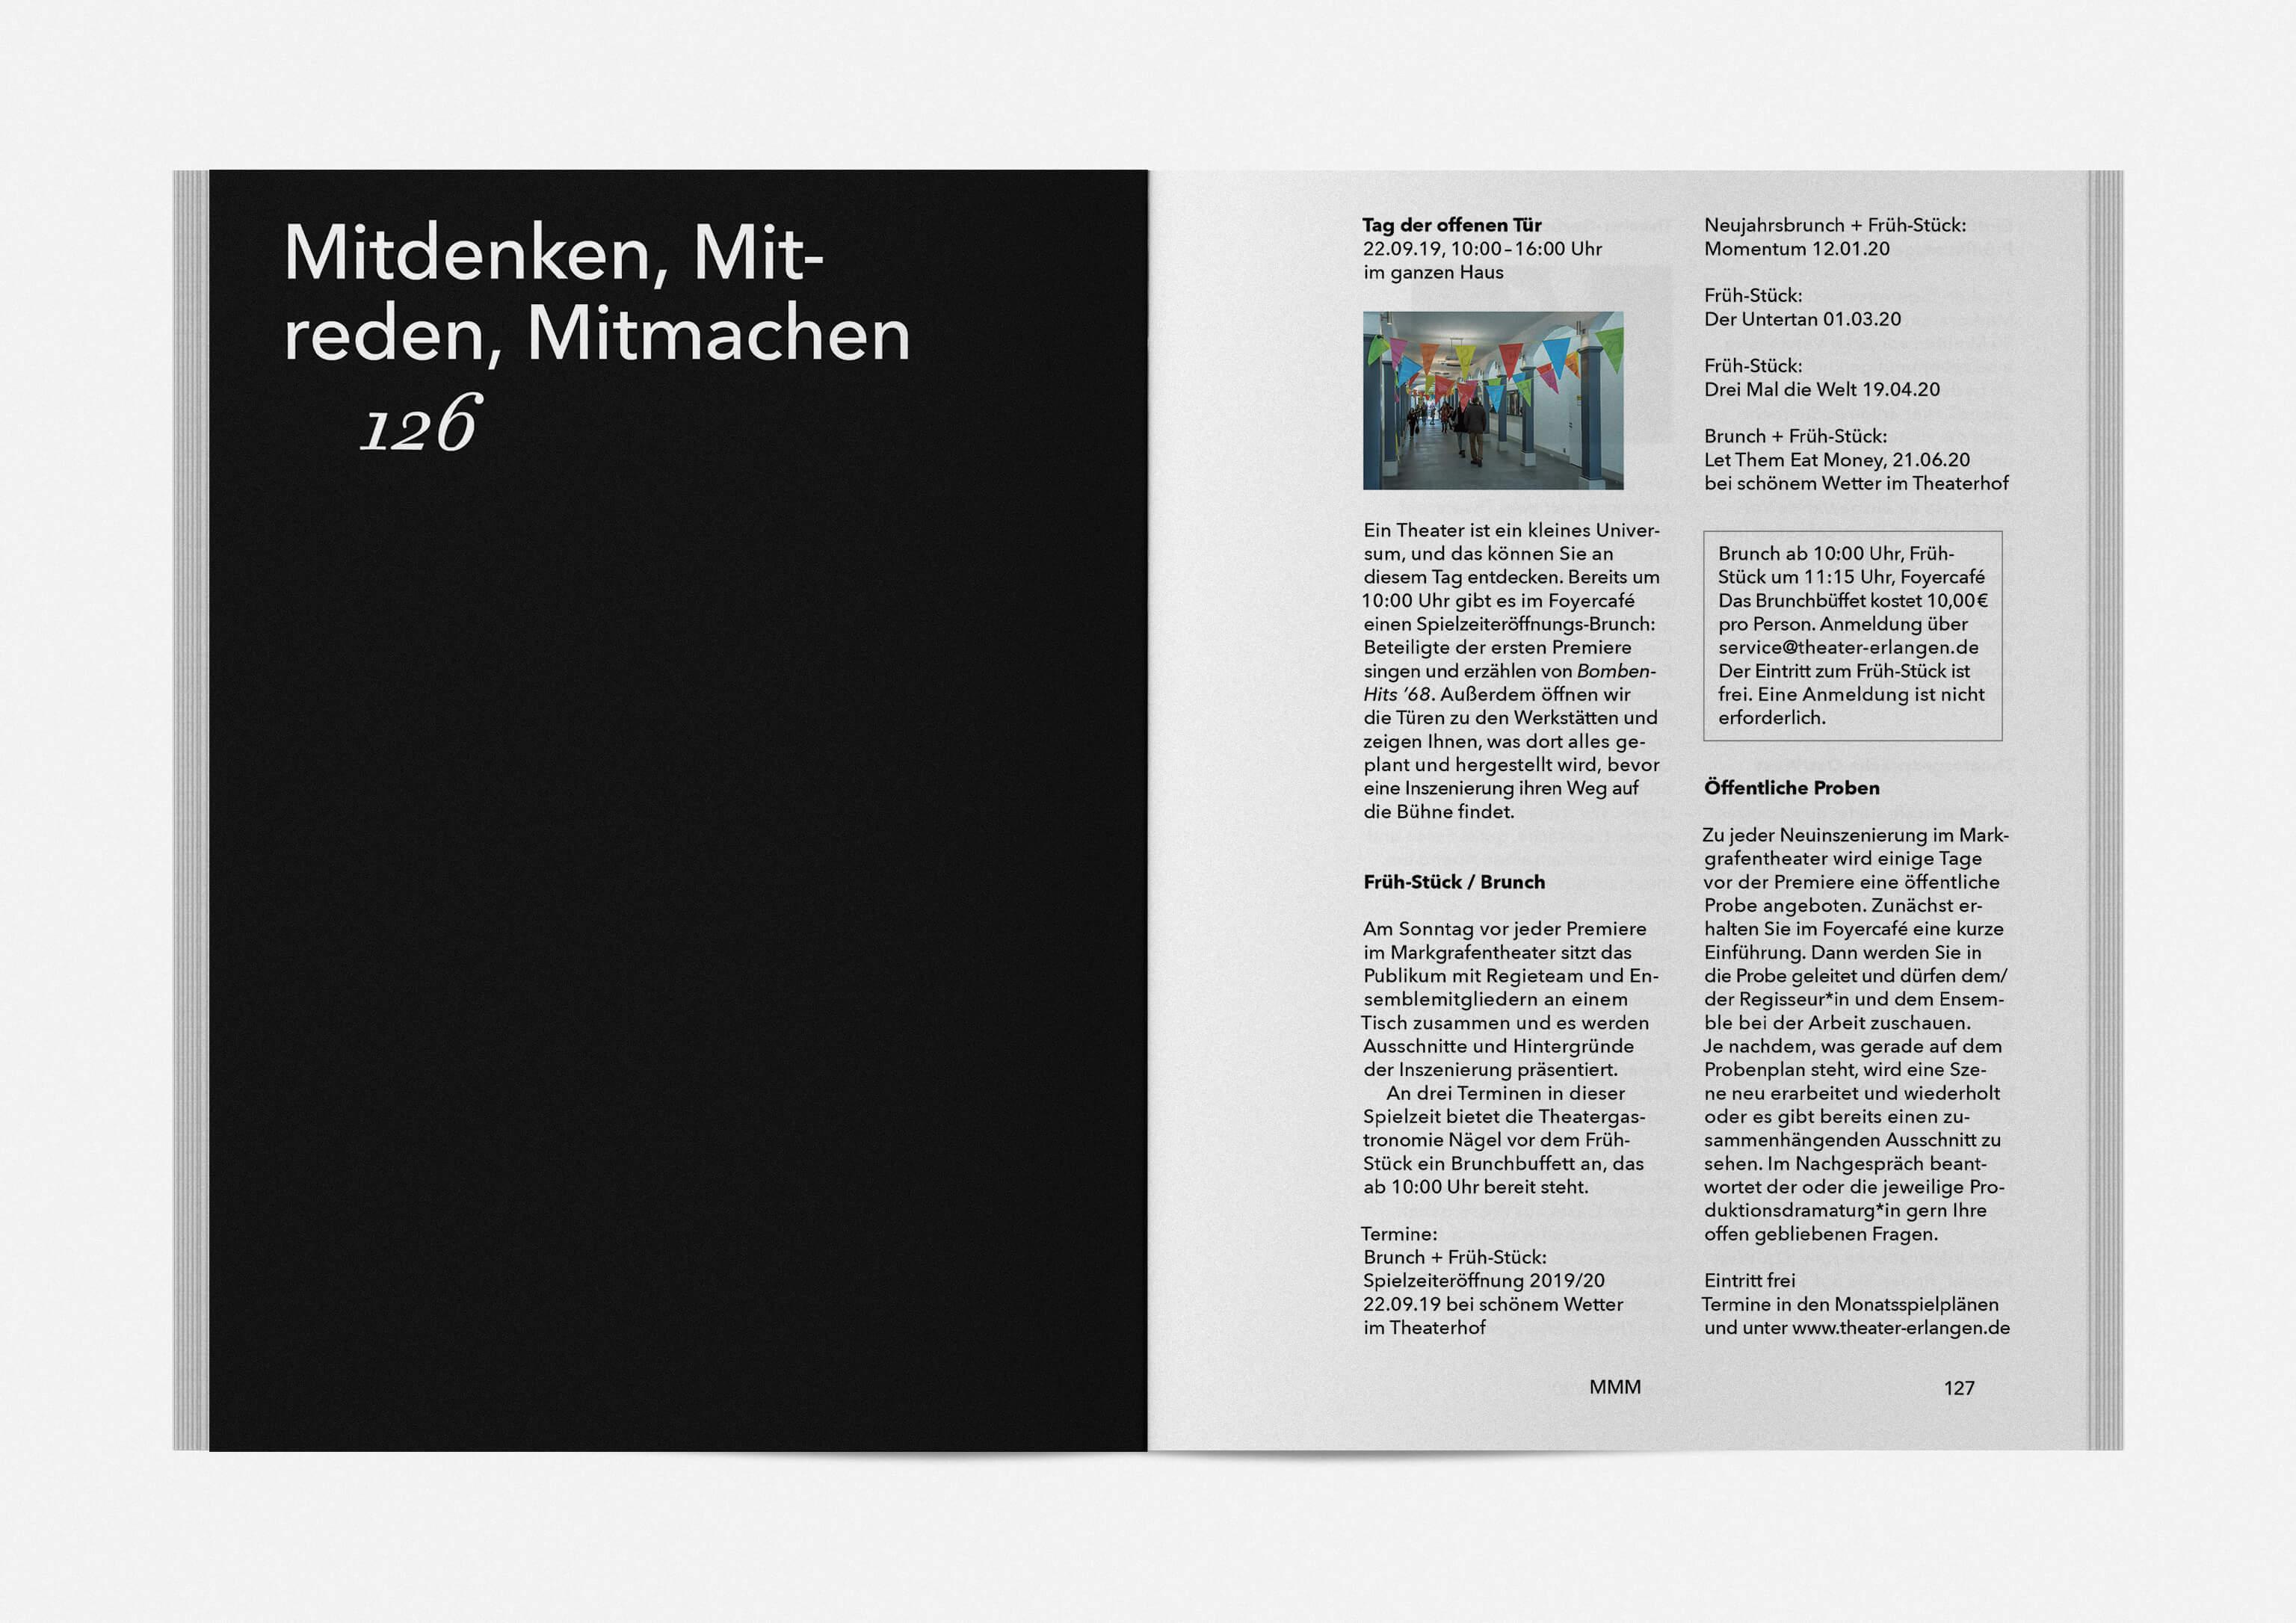 https://neuegestaltung.de/media/pages/clients/theater-erlangen-season-program-19-20/f57951cc72-1597415334/te_szh_19_20_innenseite_126_127_ng.jpg